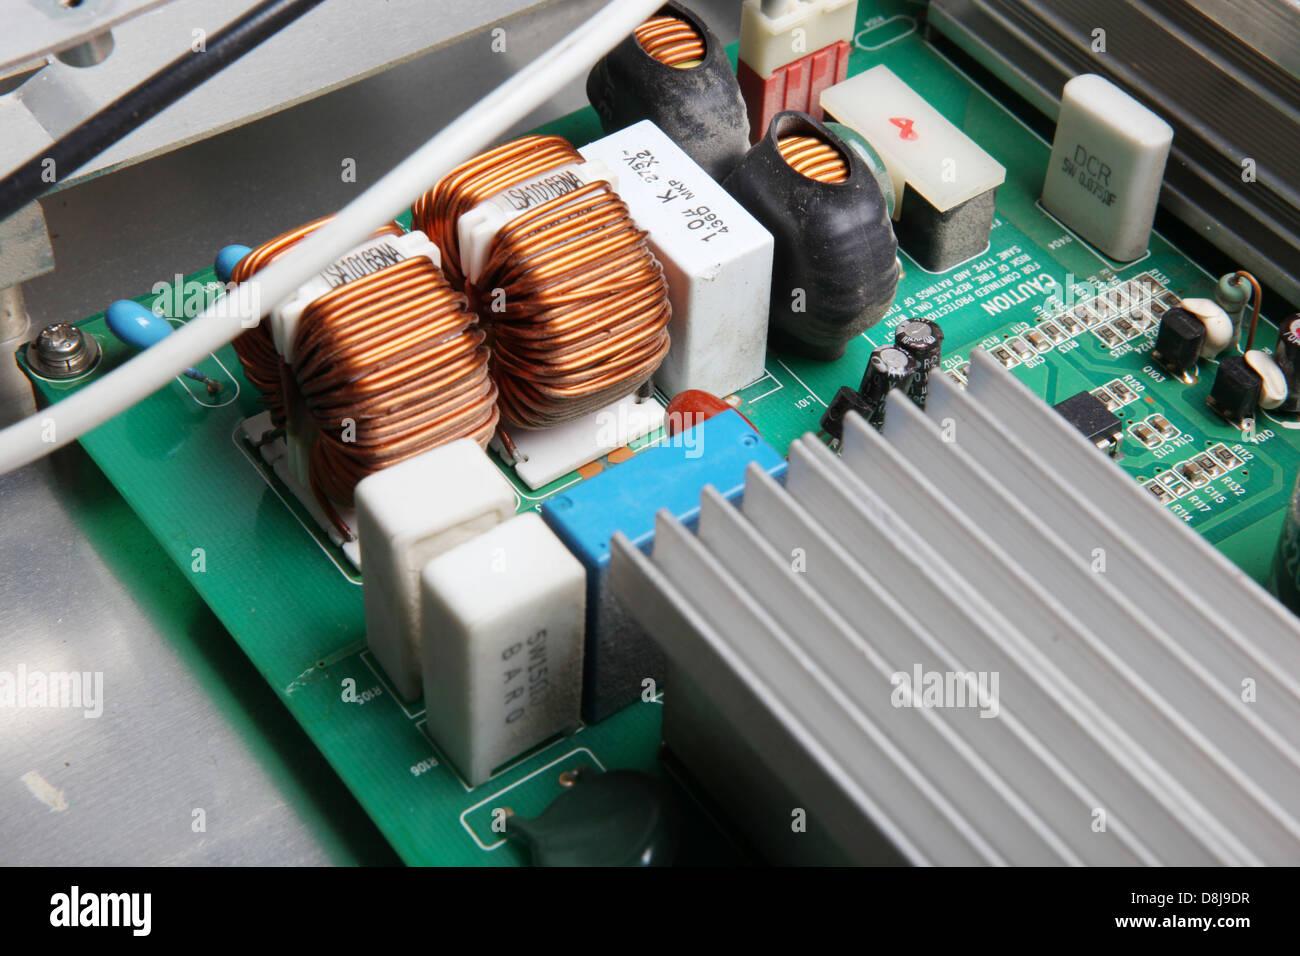 computer hardware - Stock Image